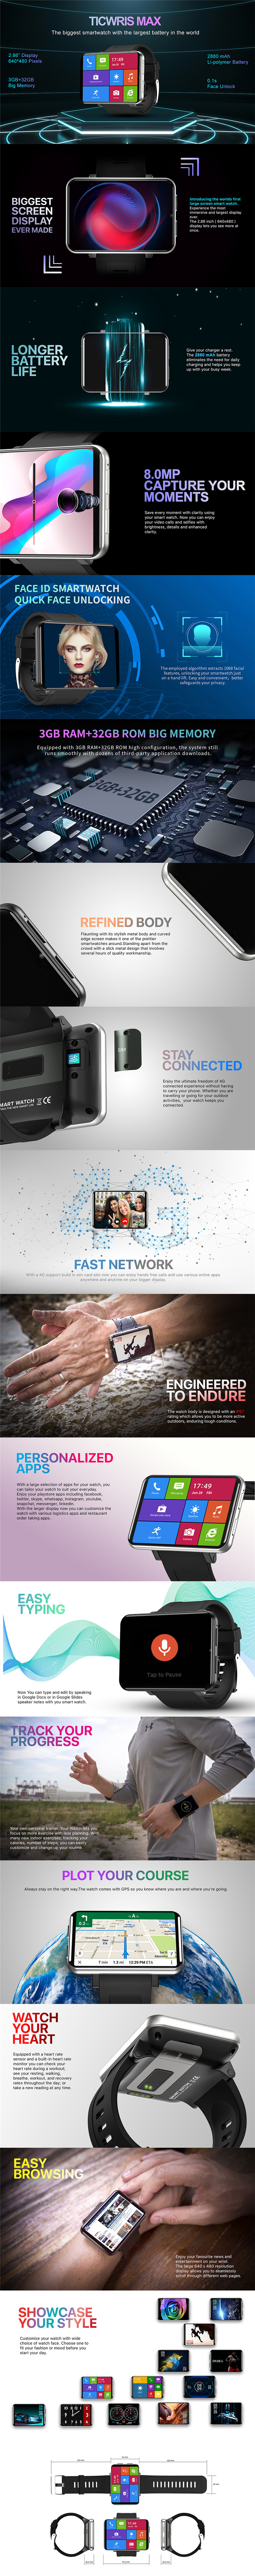 Ticwris max 4G smart watch phone